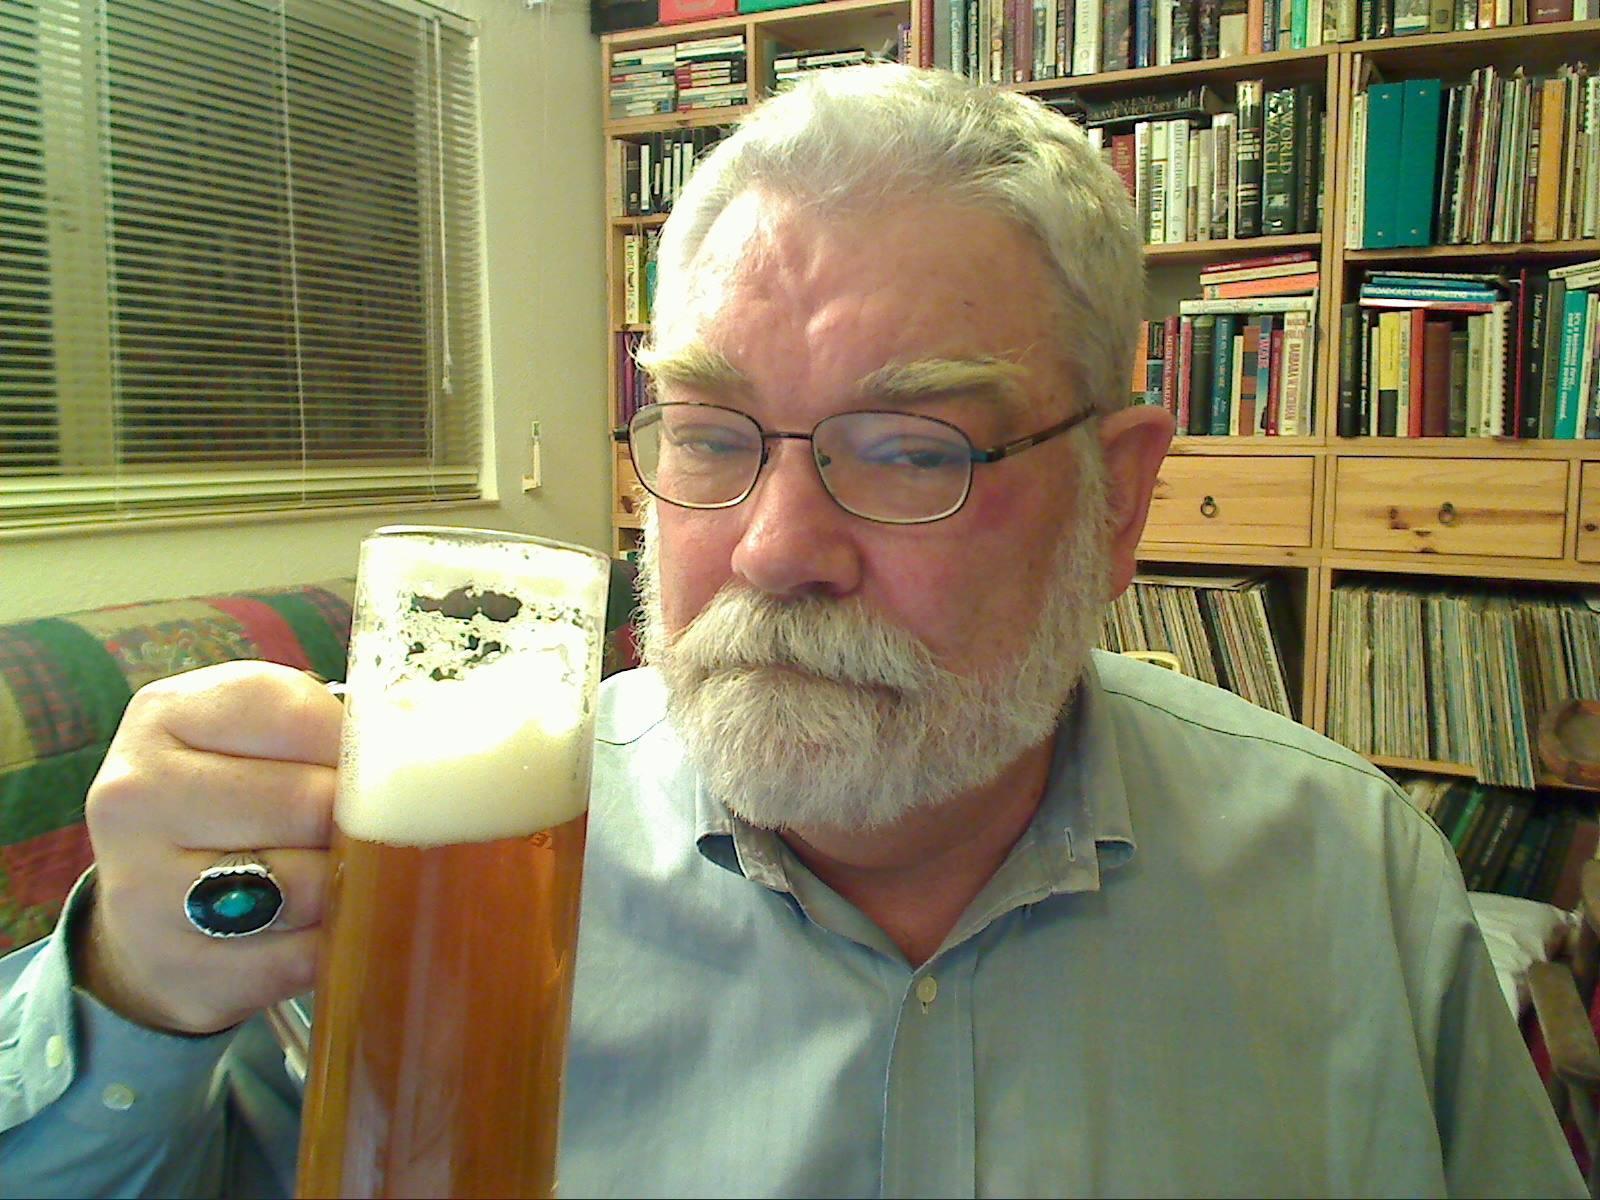 Drinking-beer-tim